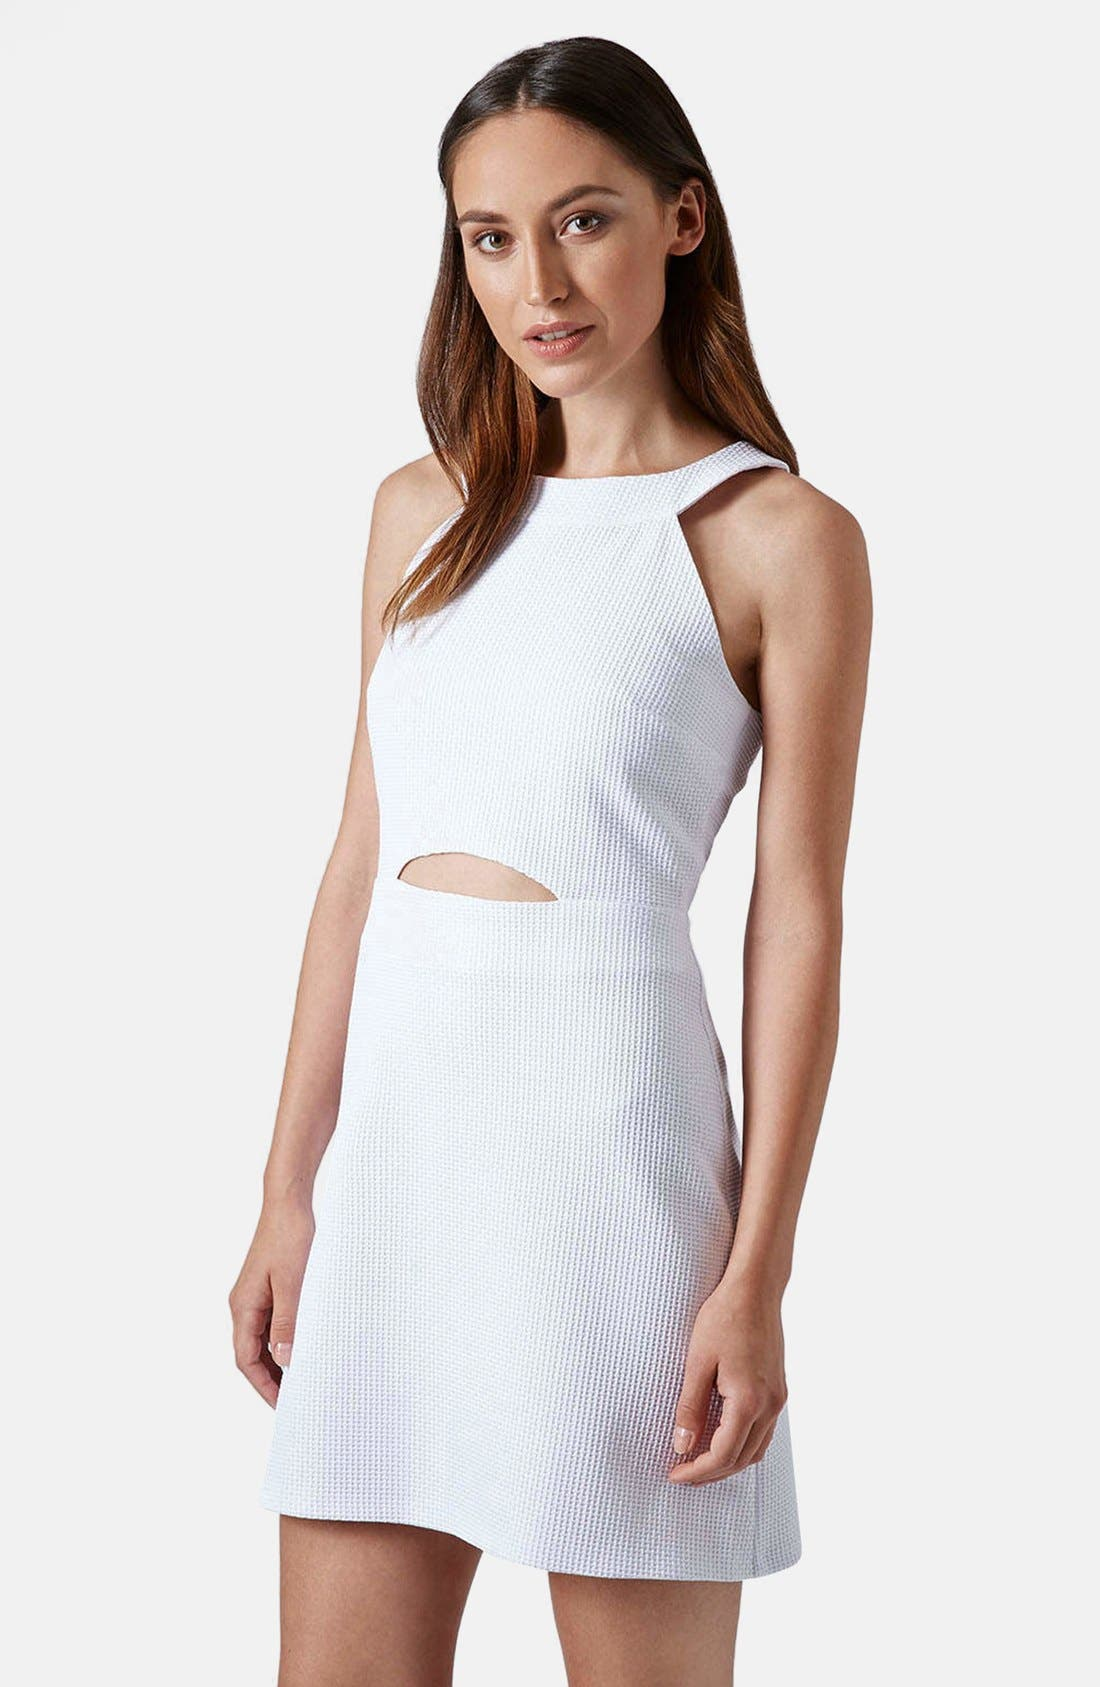 Alternate Image 1 Selected - Topshop Cutout Textured Skater Dress